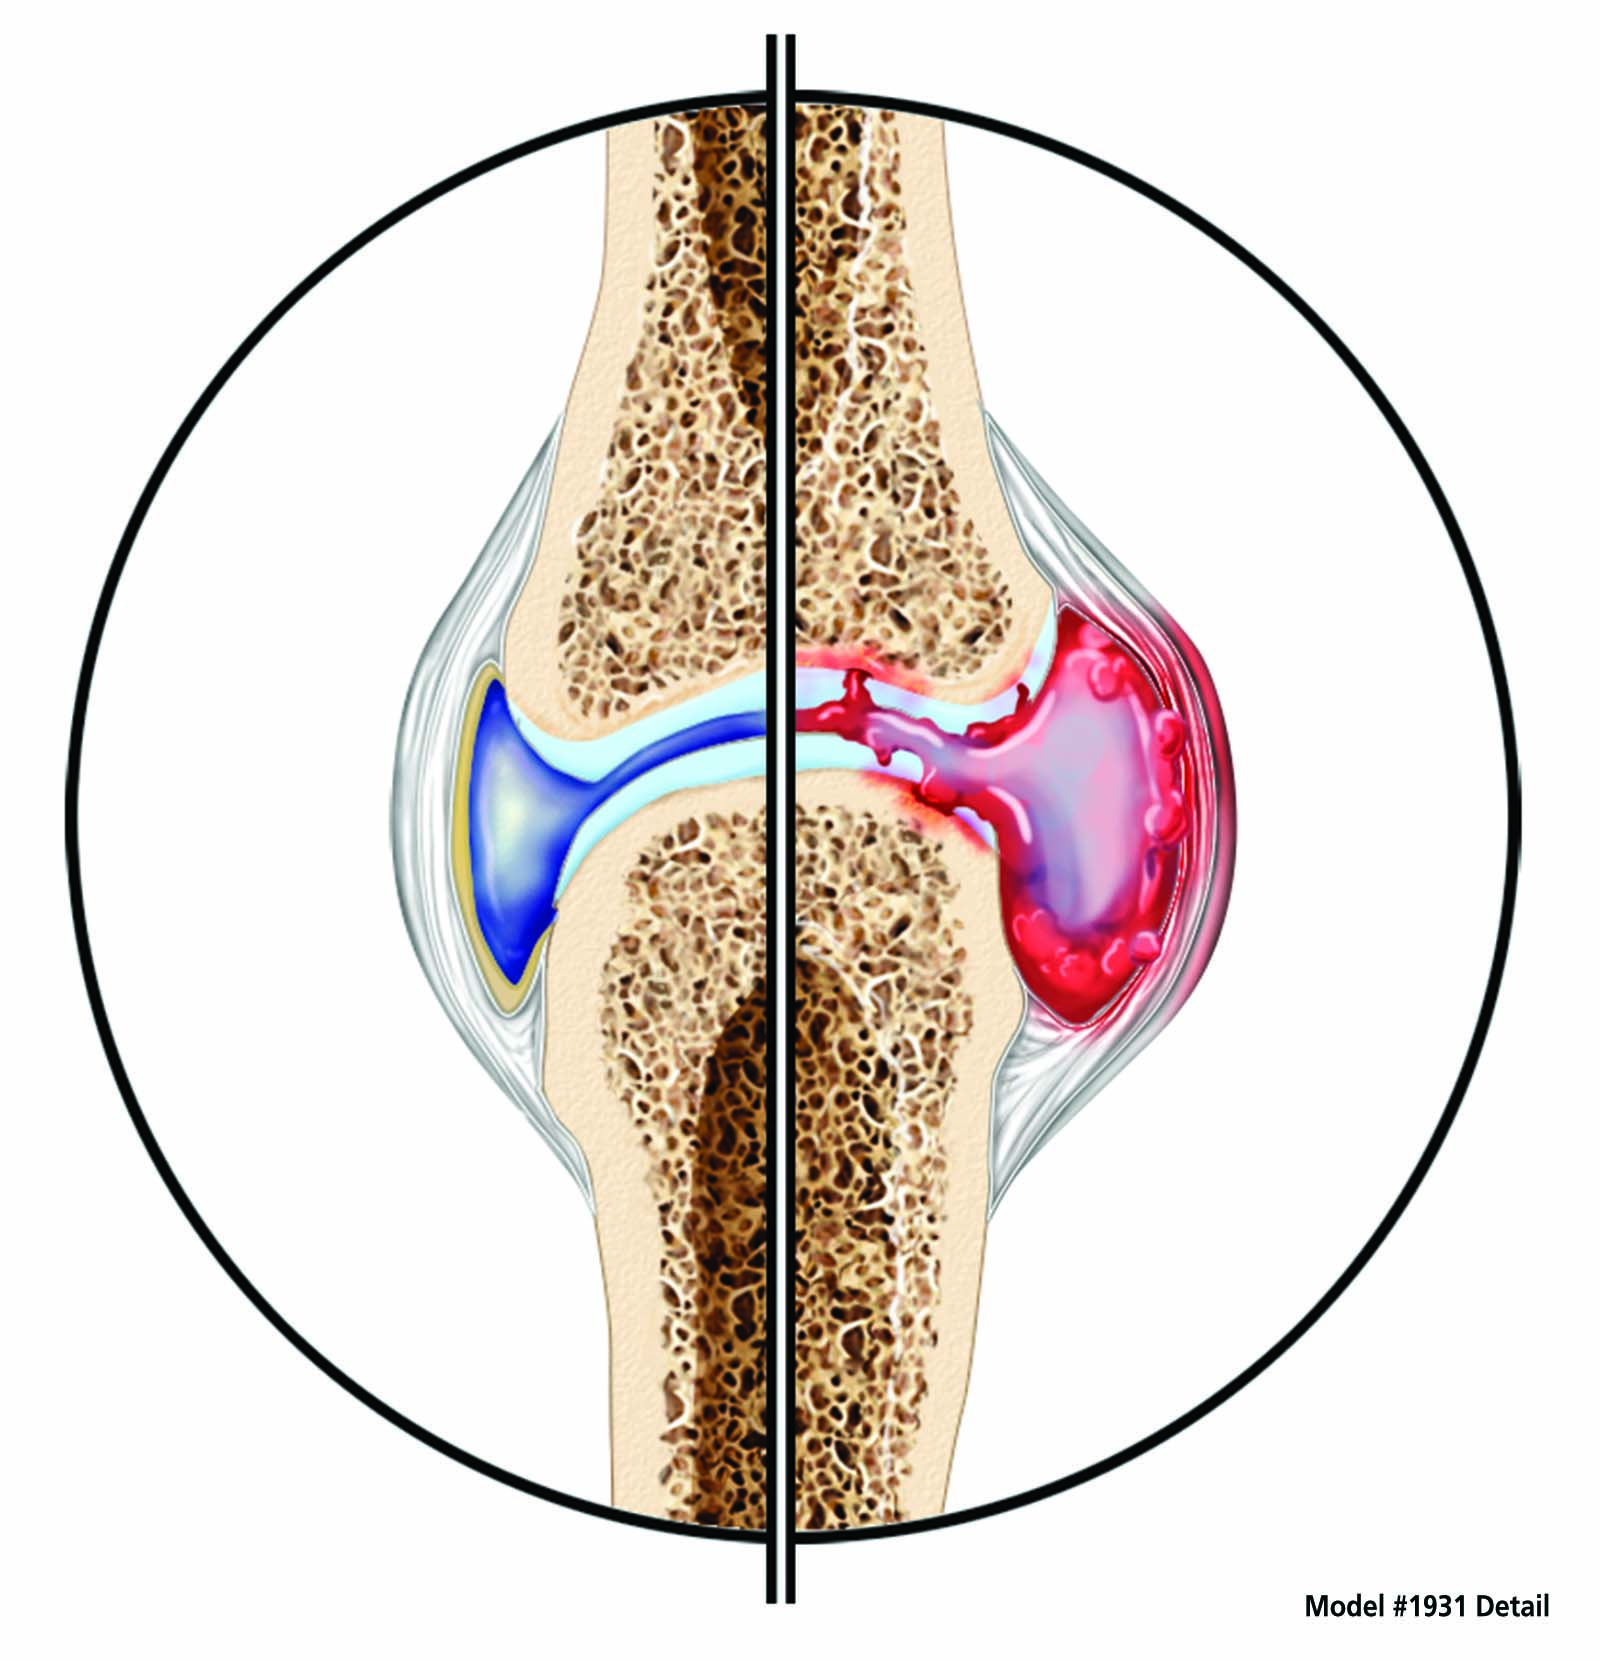 Hand Rheumatoid Arthritis RA Anatomical Model